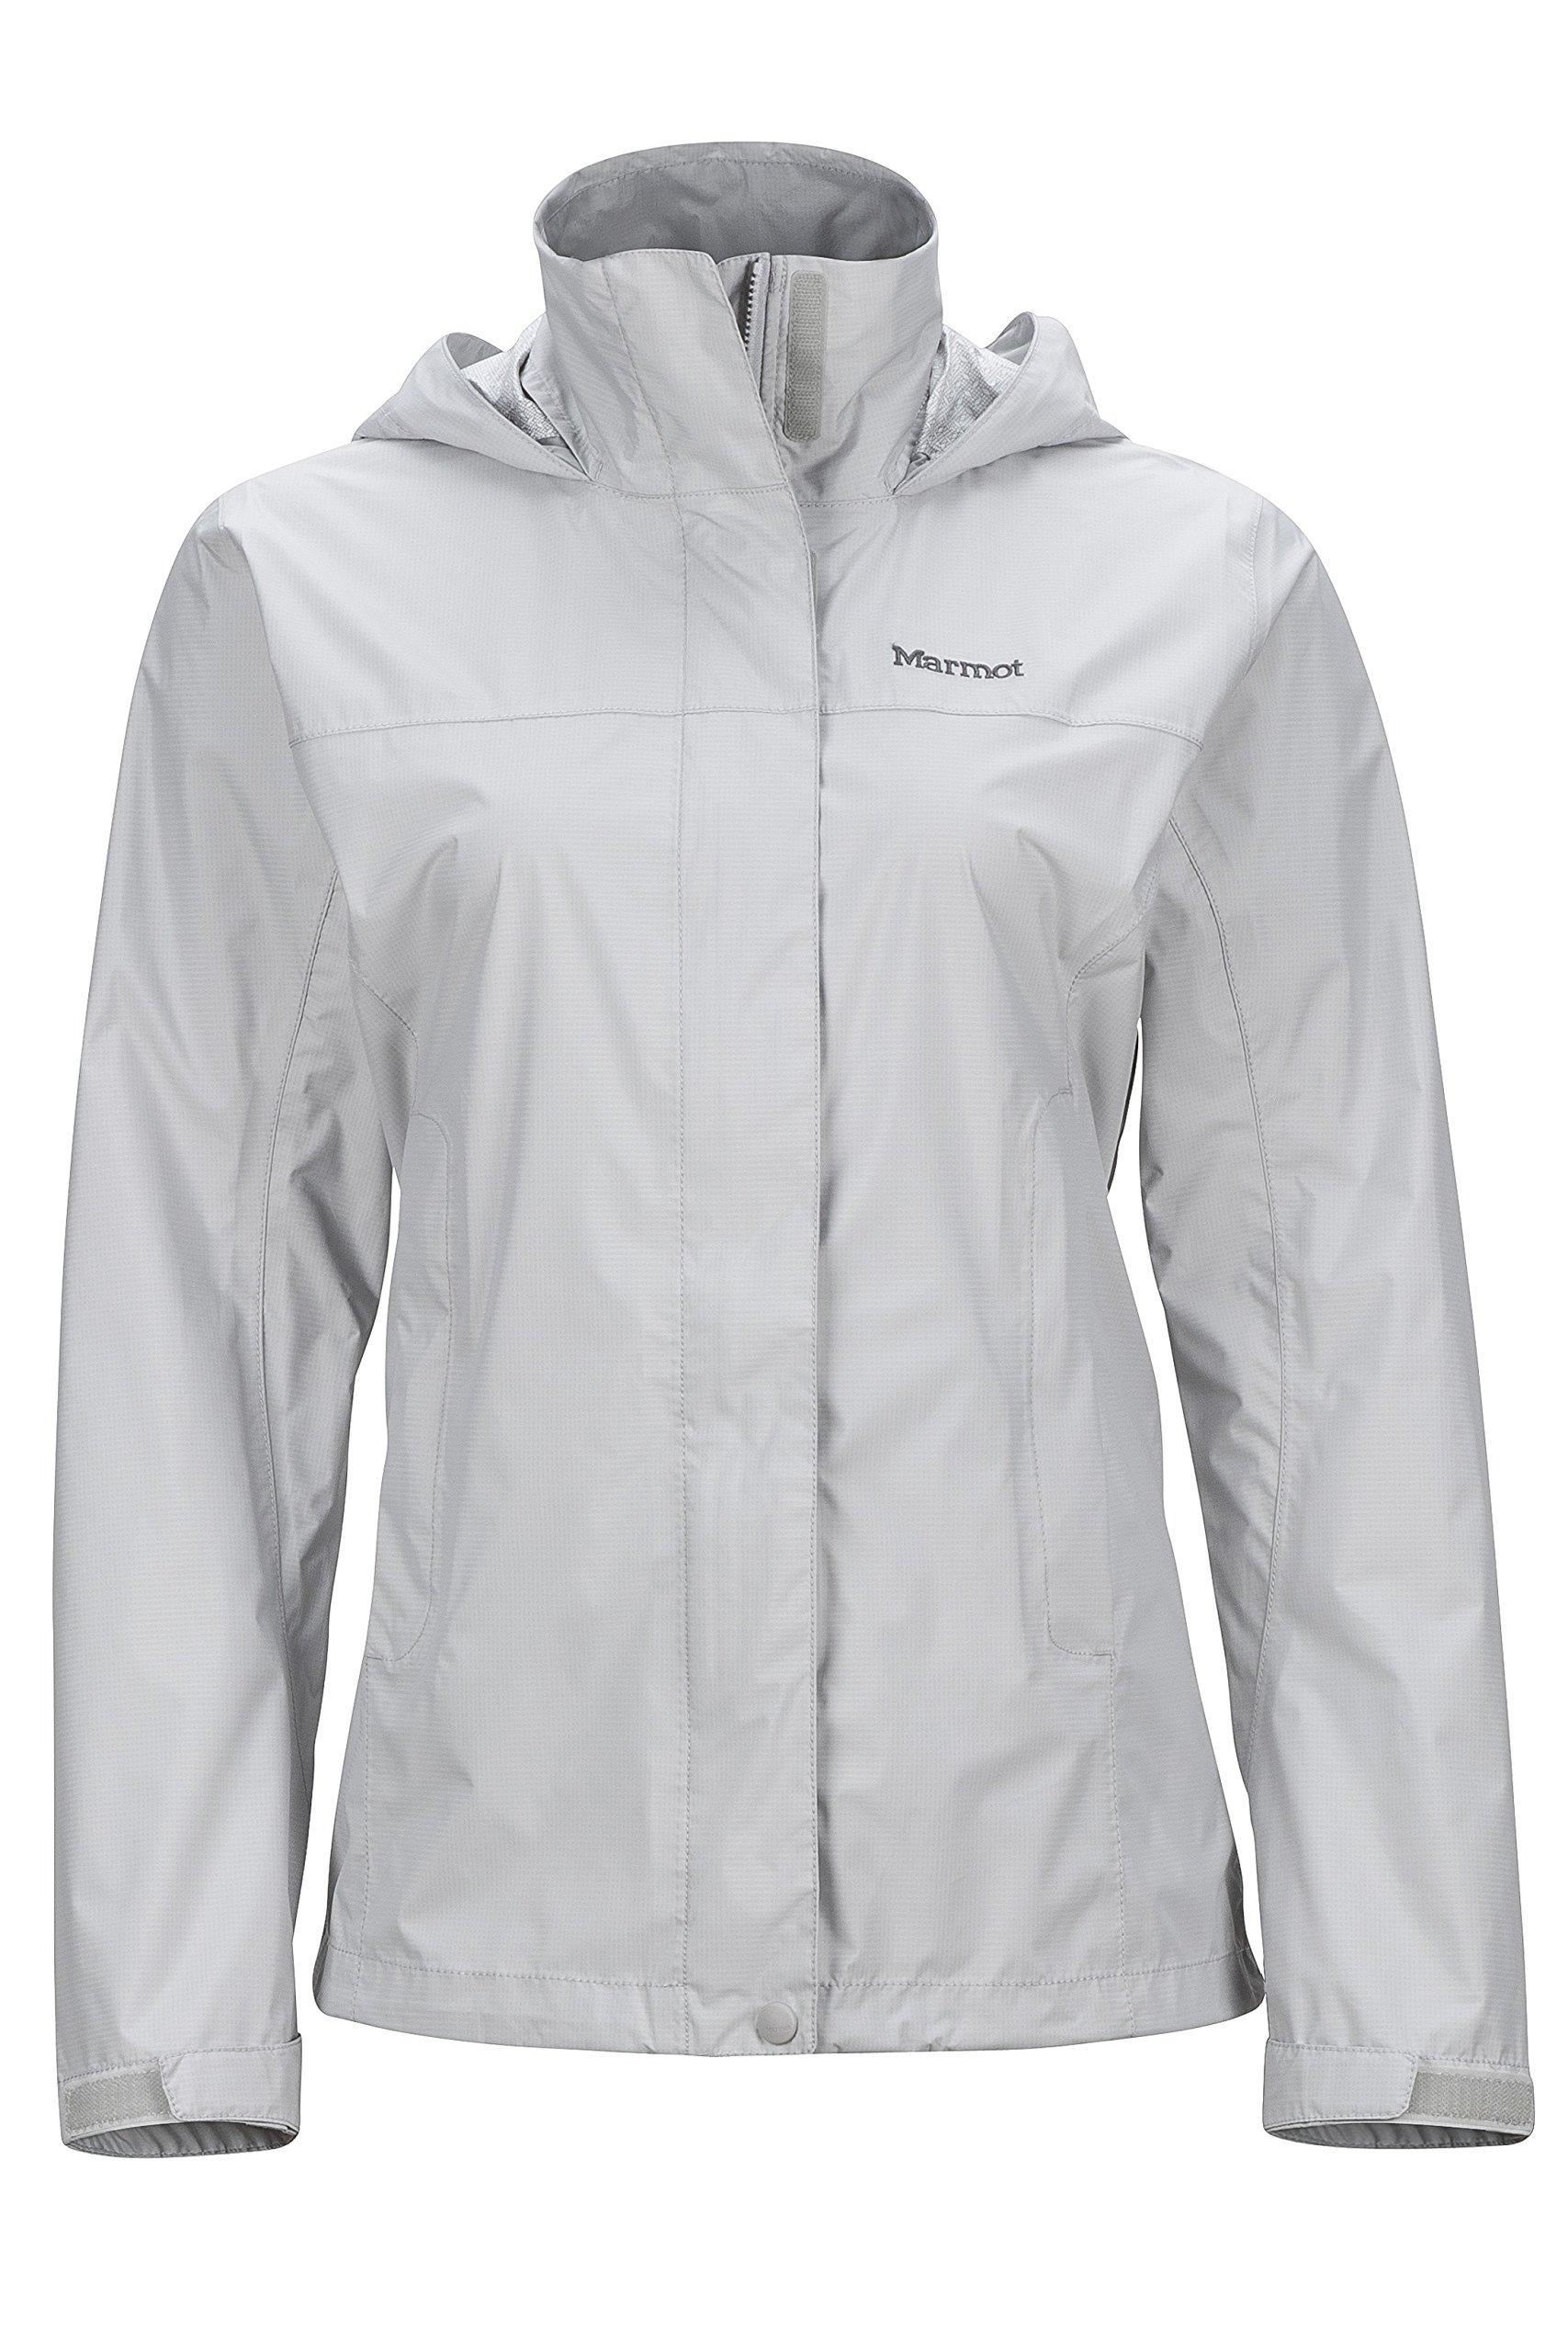 Marmot PreCip Women's Lightweight Waterproof Rain Jacket, Platinum, X-Small